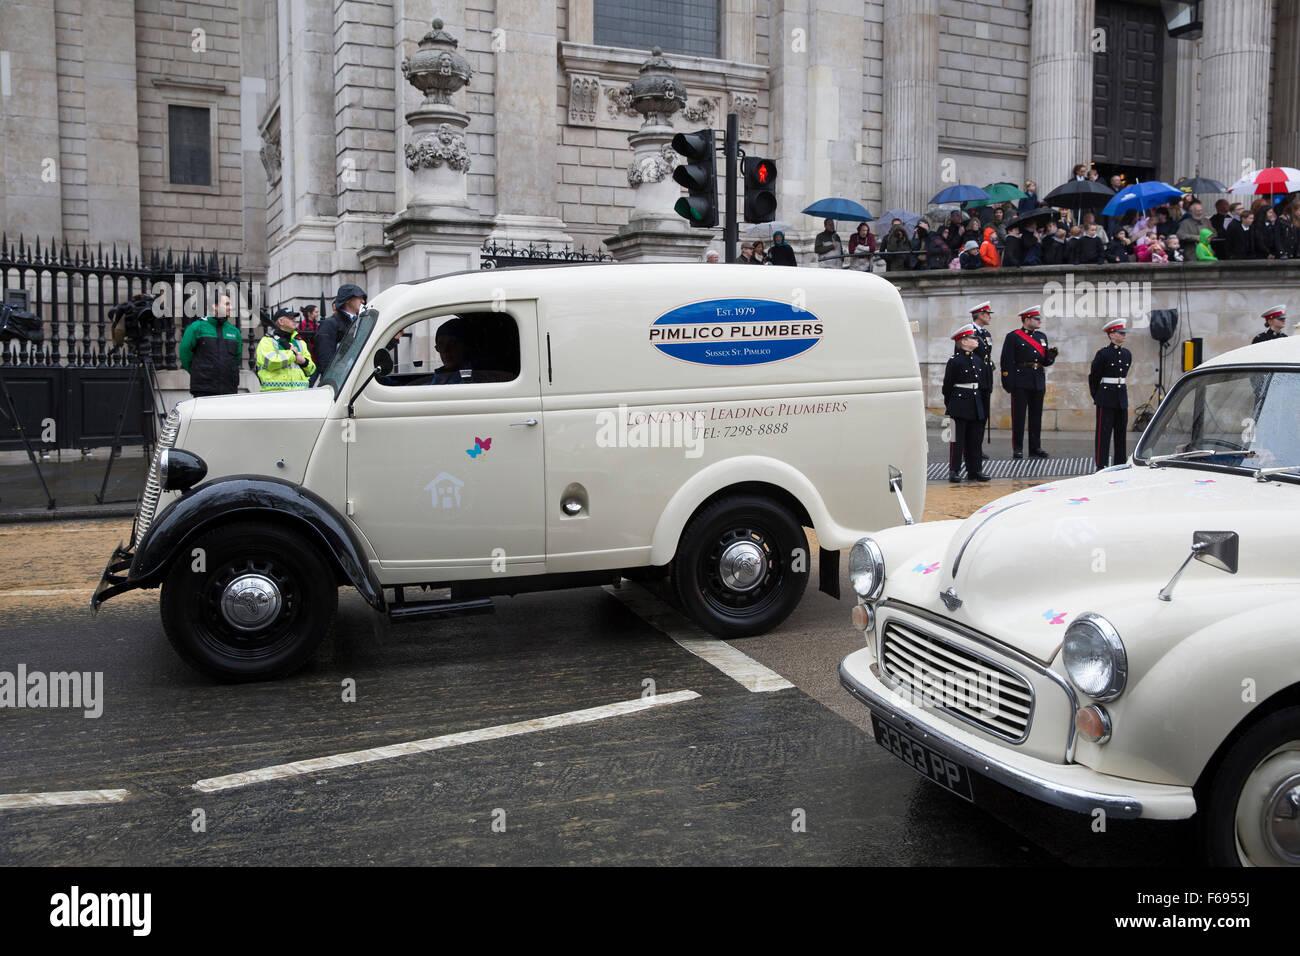 Pimlico Plumbers van, London, UK Stock Photo, Royalty Free Image ...